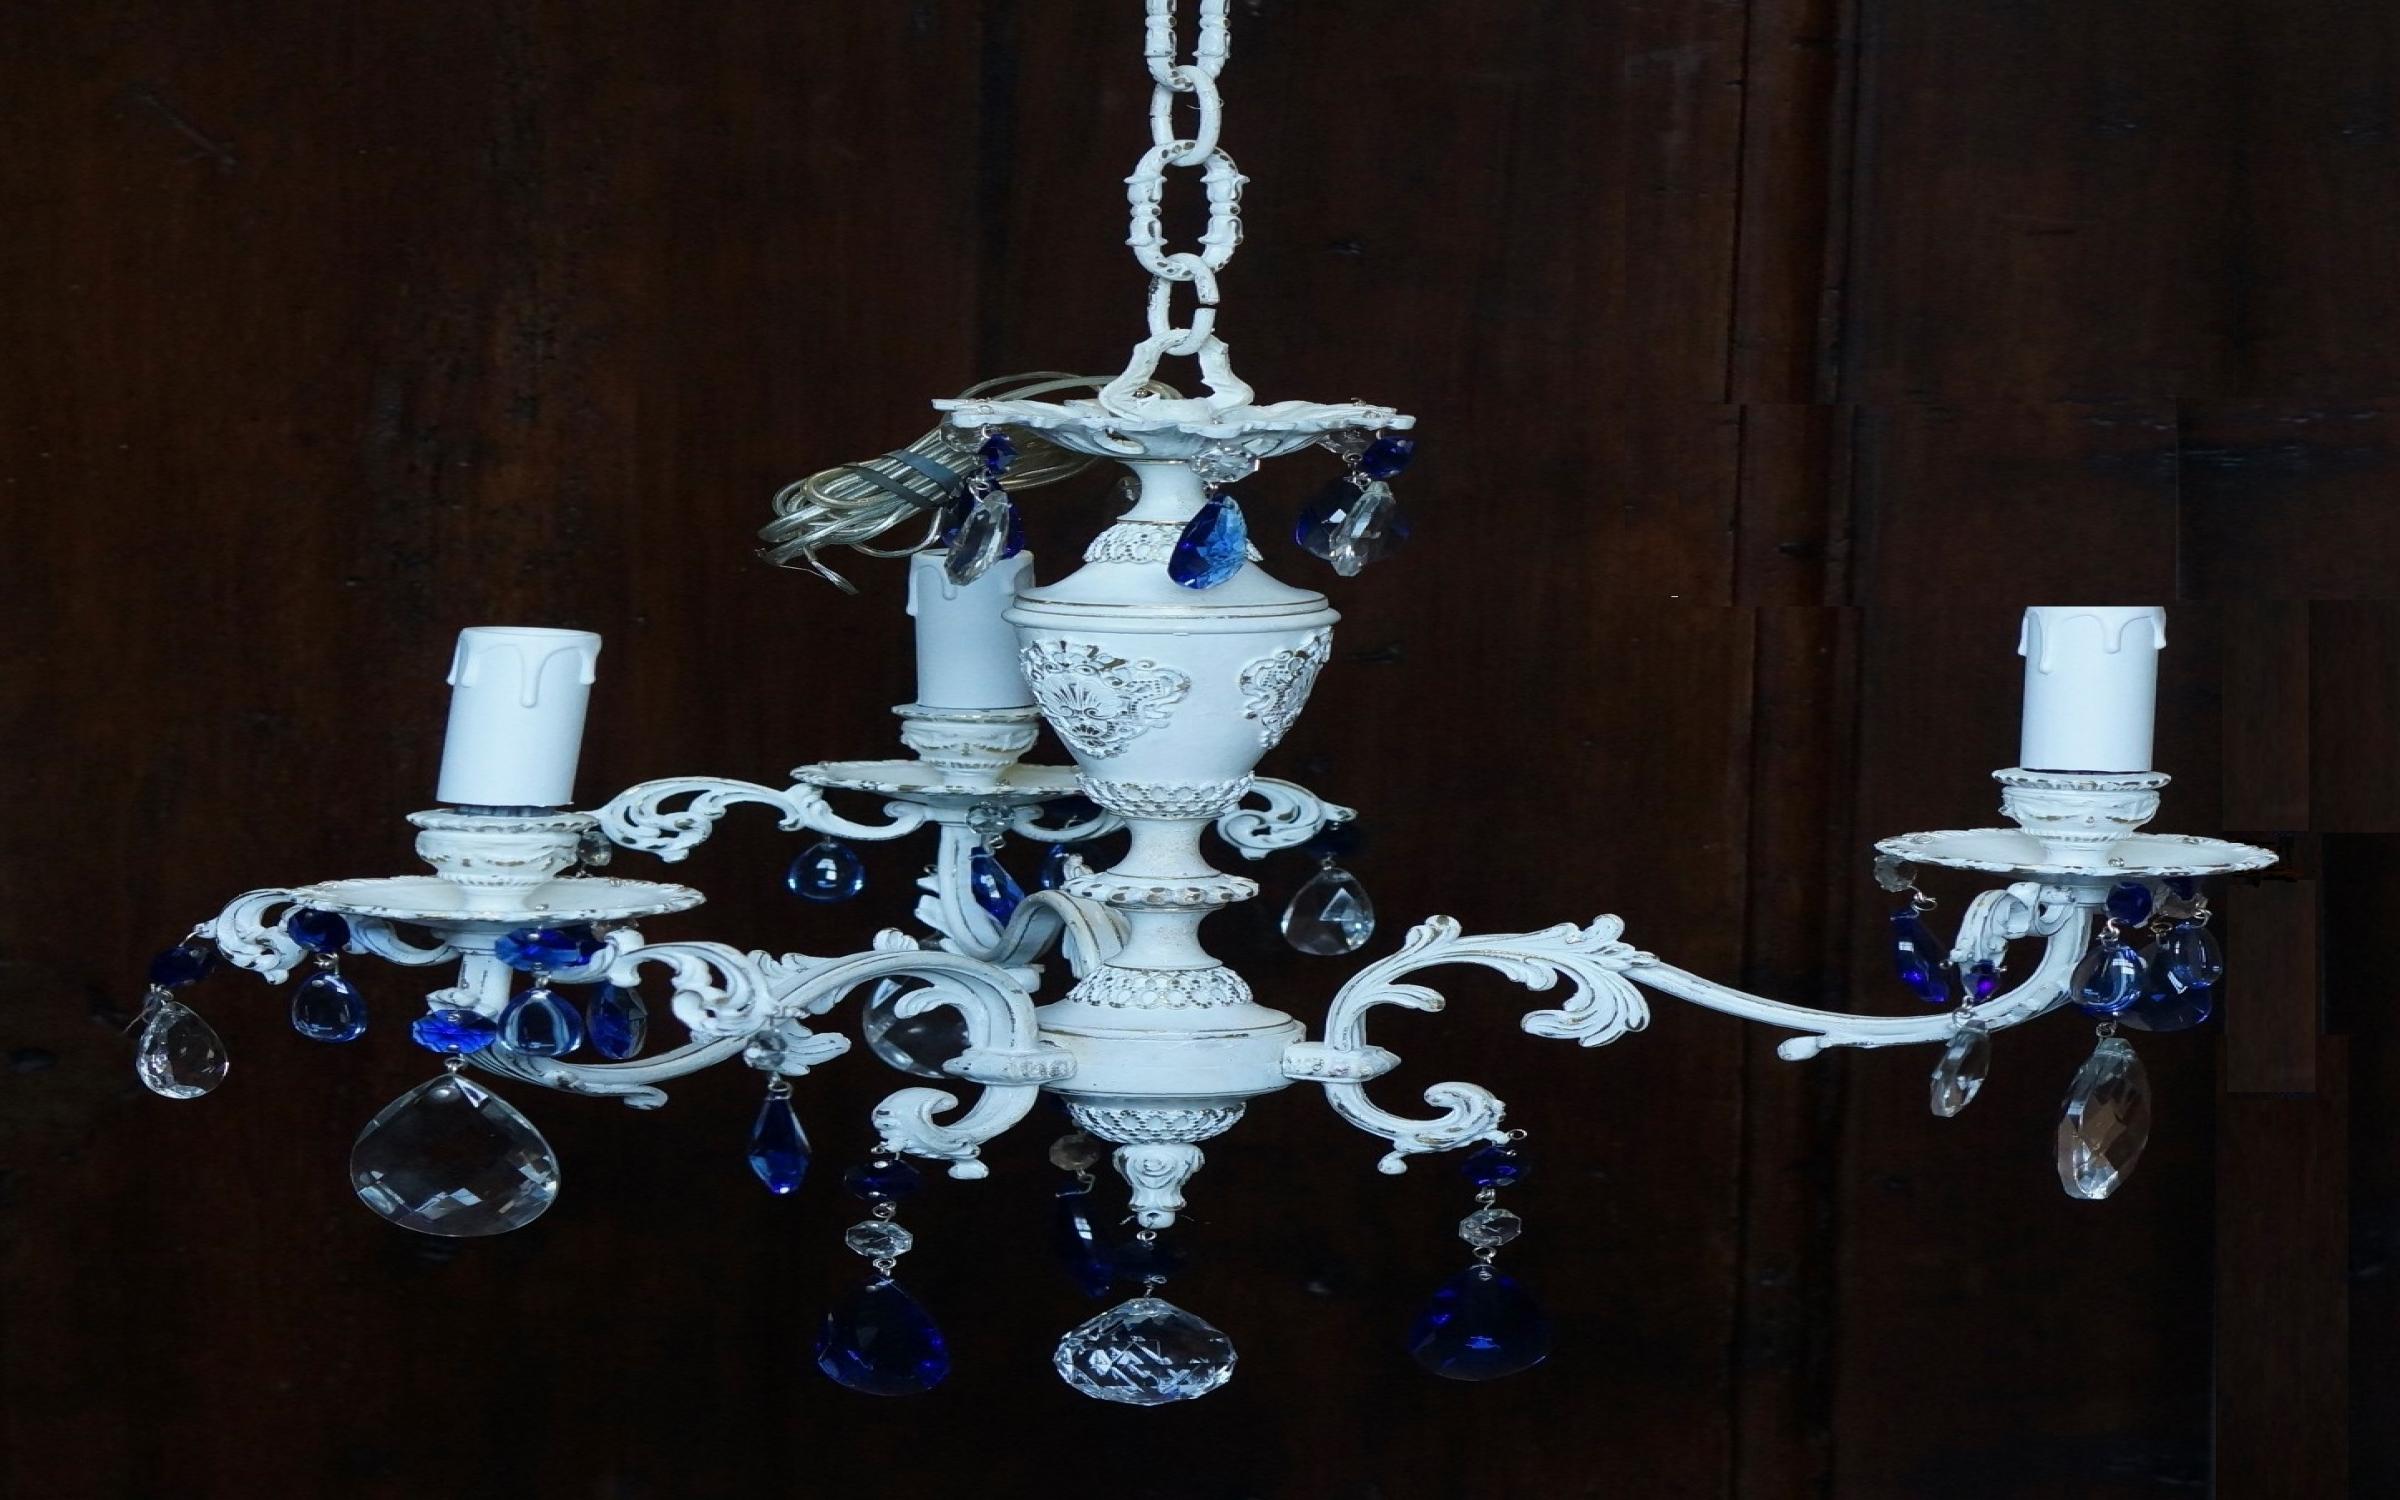 Lampadari Per Casa Al Mare bovina di daniela bovina - lampadari / lampioni / rosoni